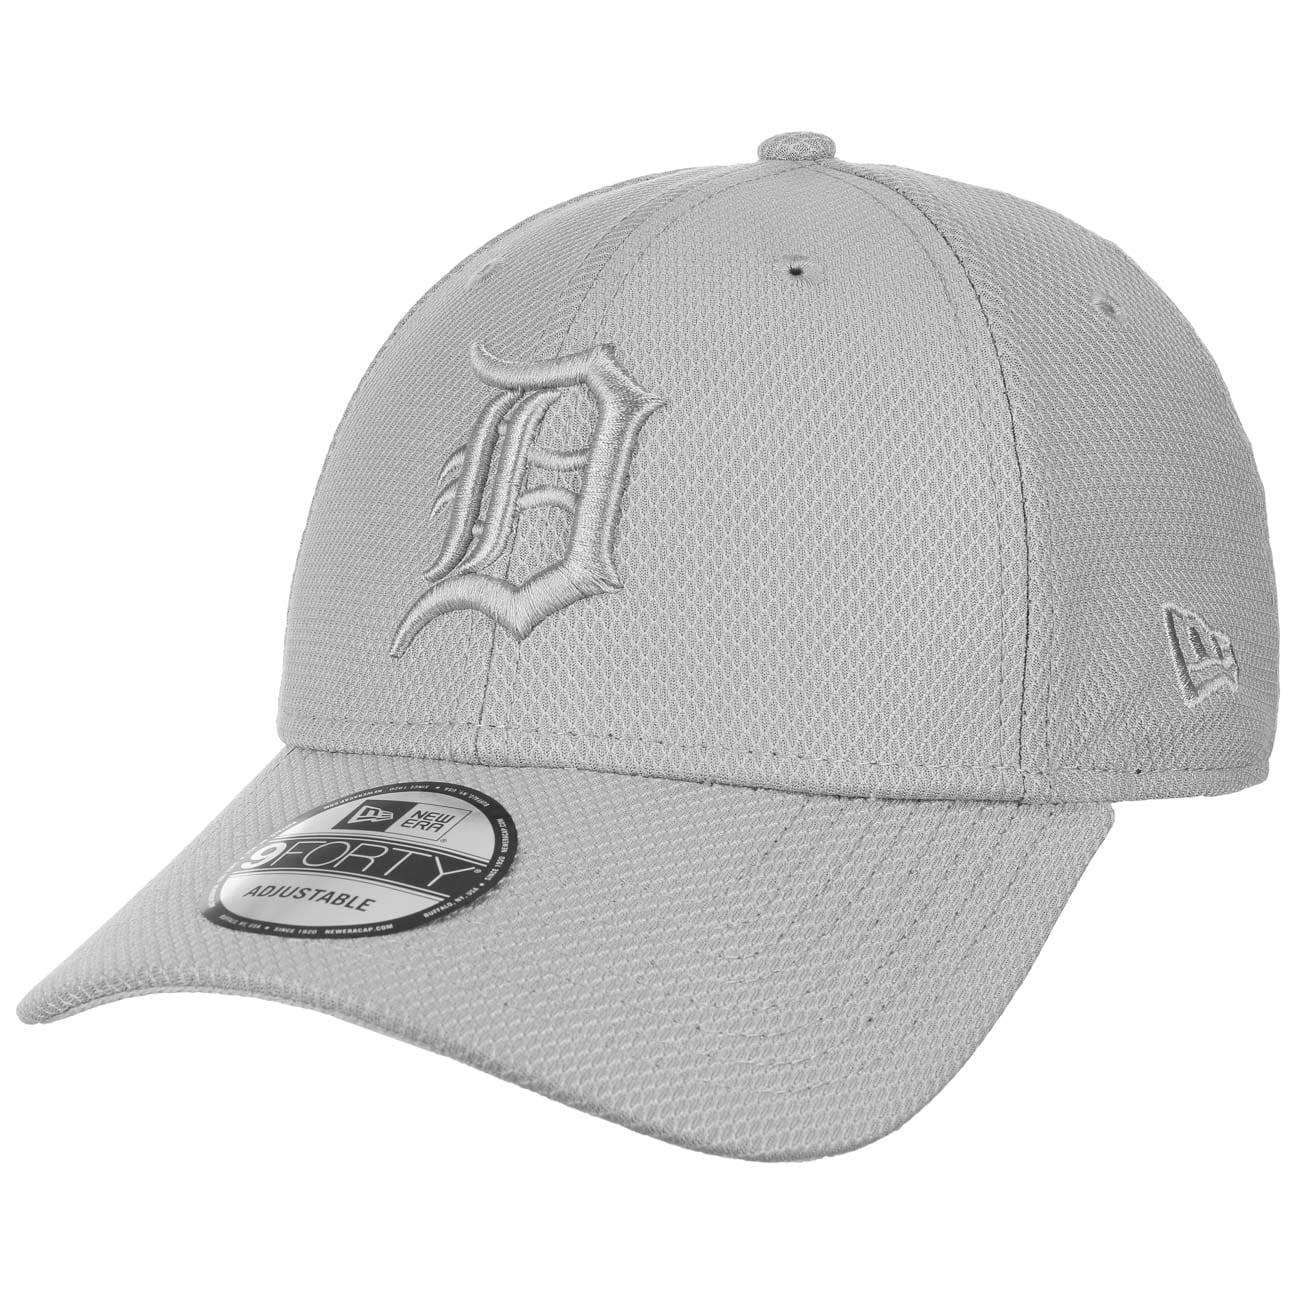 9forty-diamond-tigers-cap-by-new-era-basecap